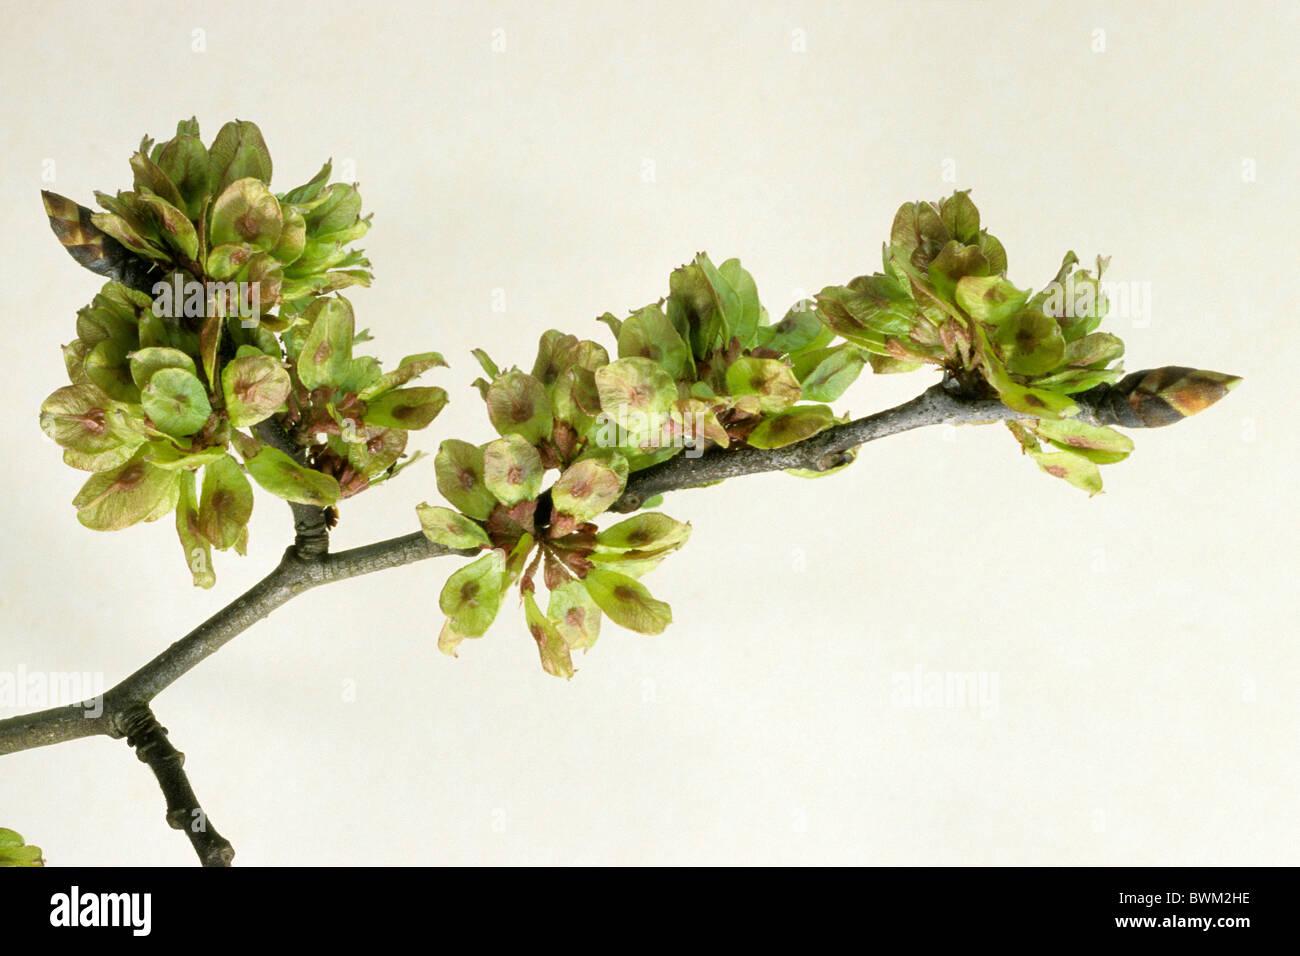 European Field Elm (Ulmus minor), twig with fruit, studio picture. - Stock Image